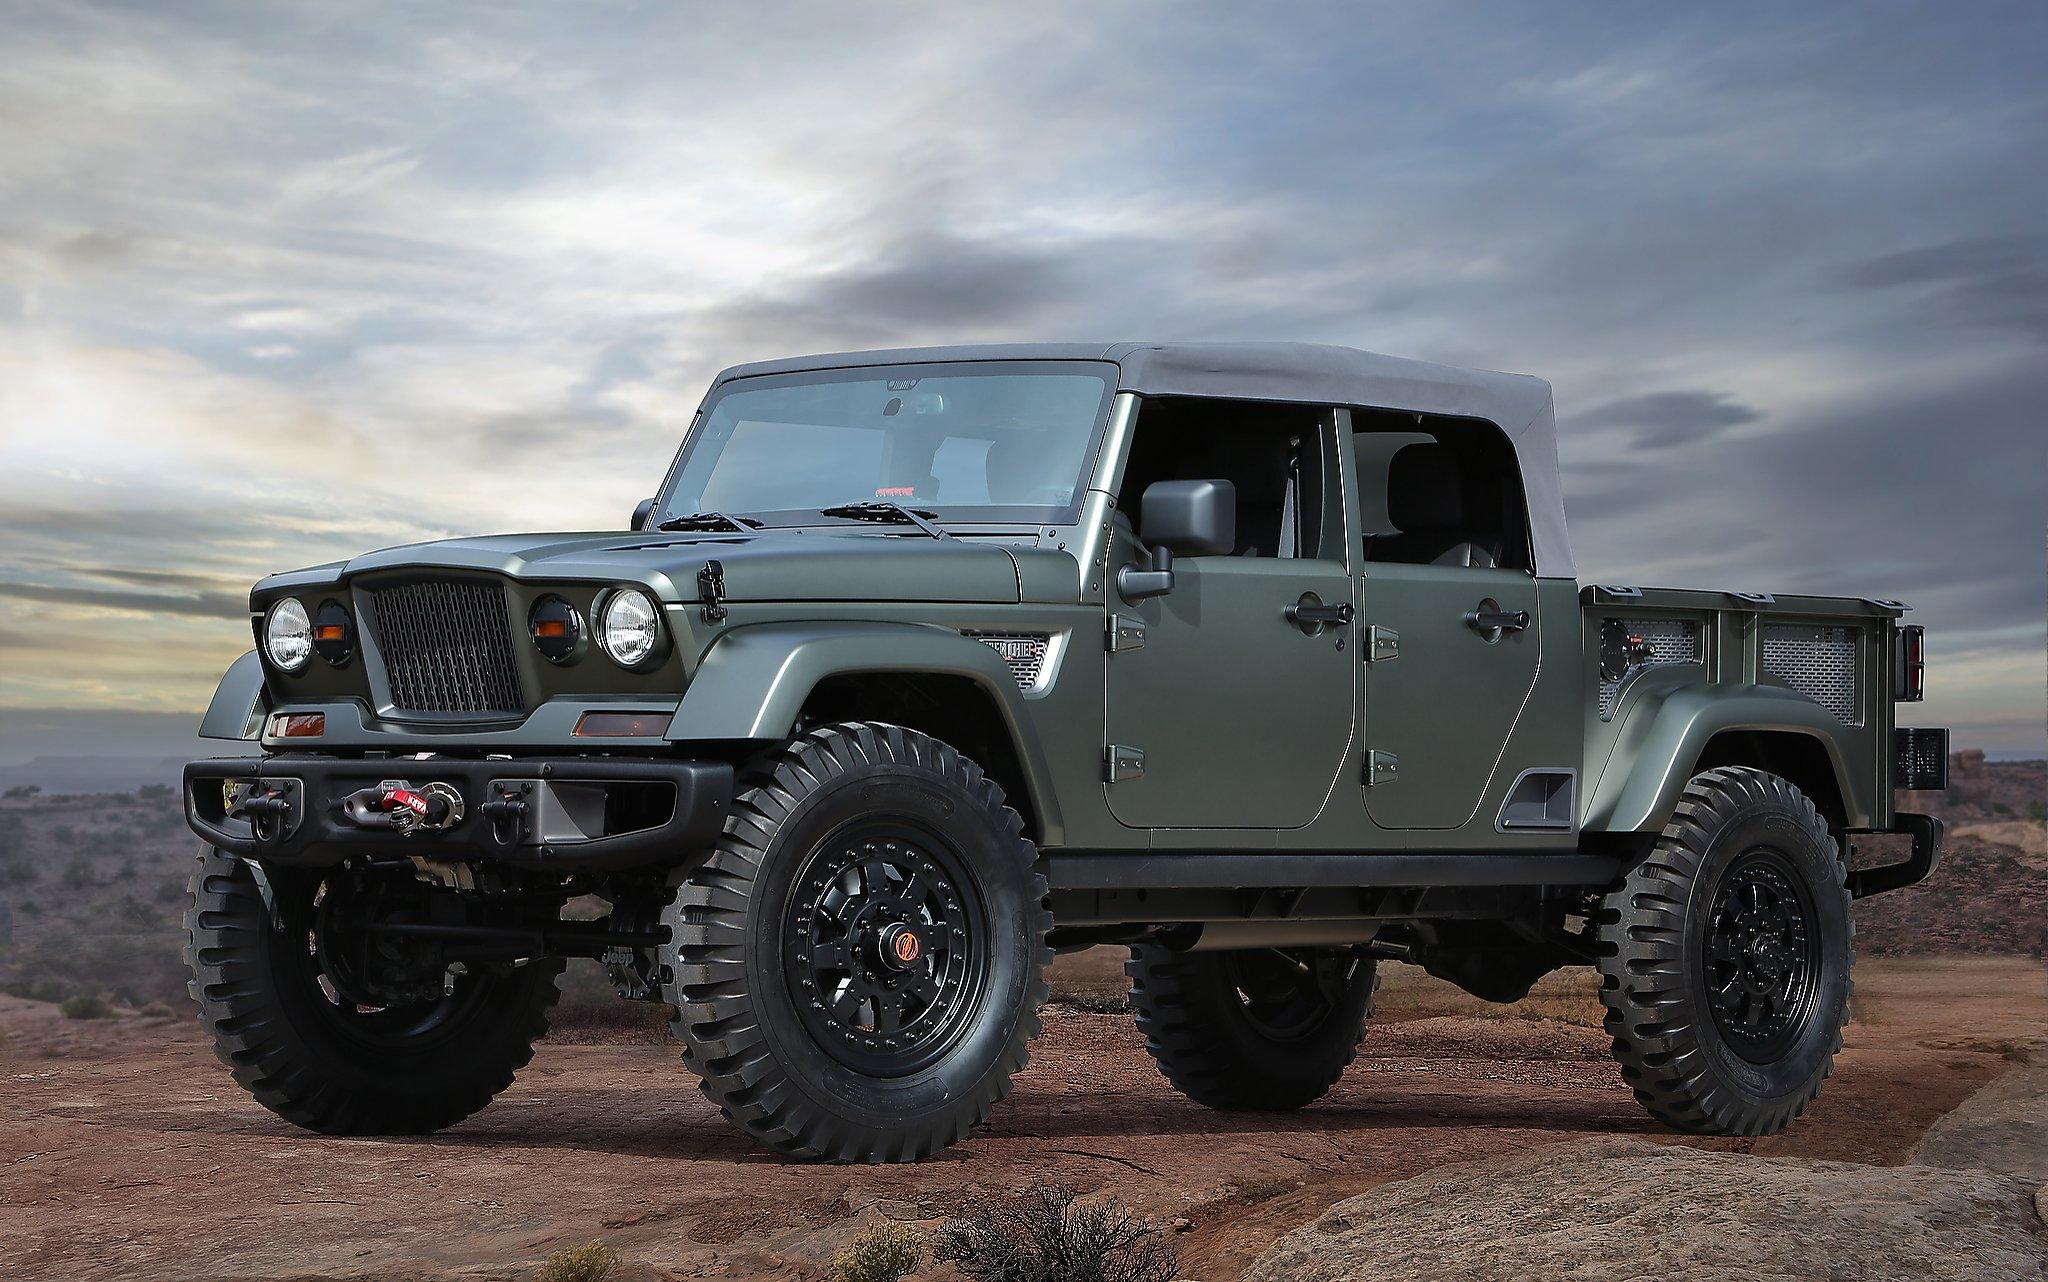 Jeep unveils seven off-road concept vehicles